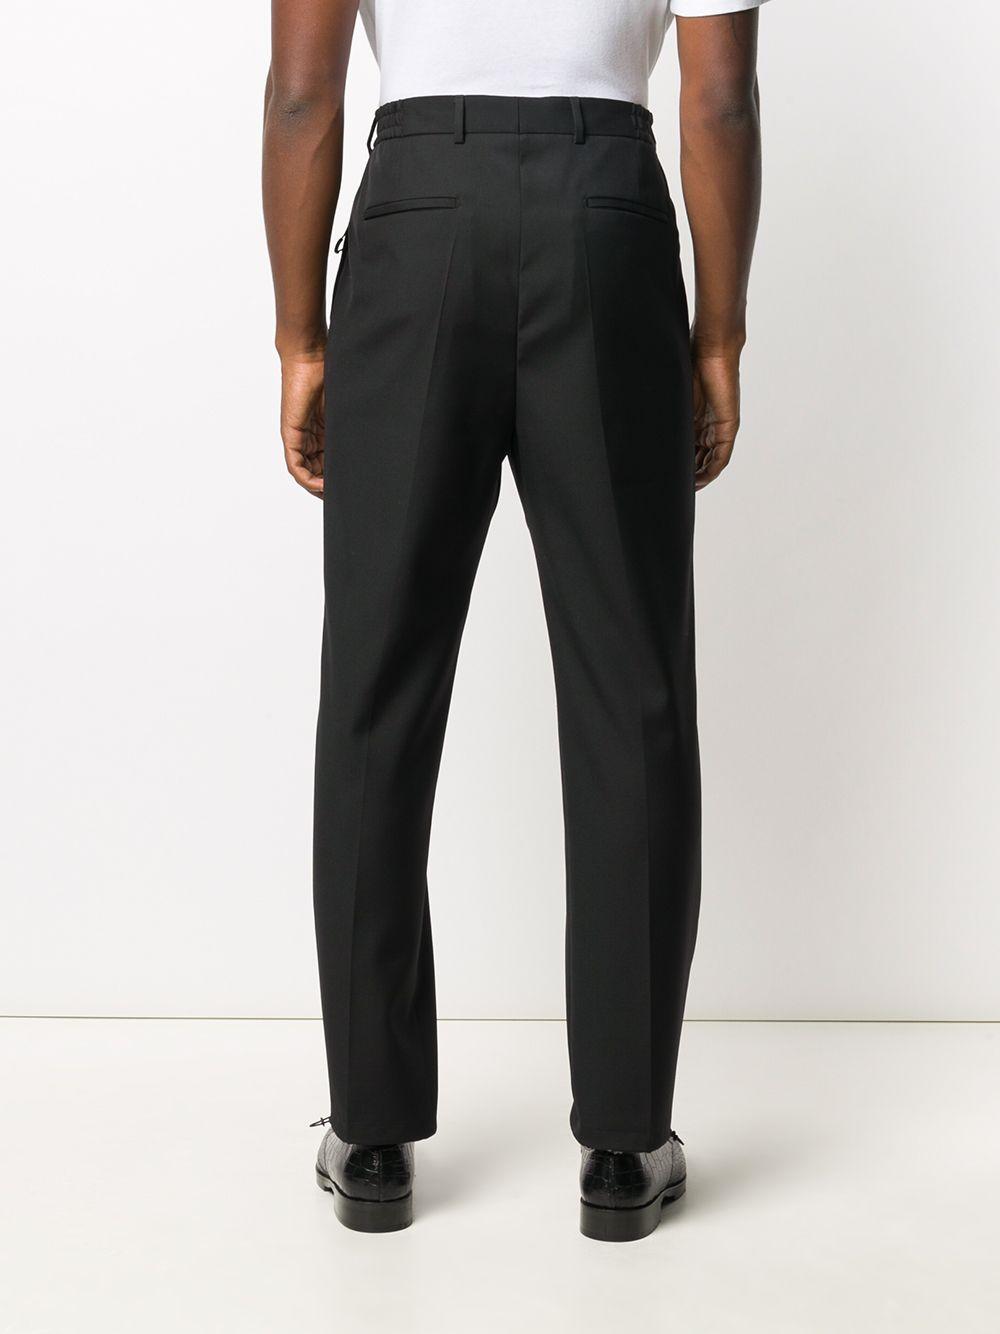 pantaloni sartoriali classici in cotone e lana neri GIVENCHY | Pantaloni | BM50KY1Y8K001